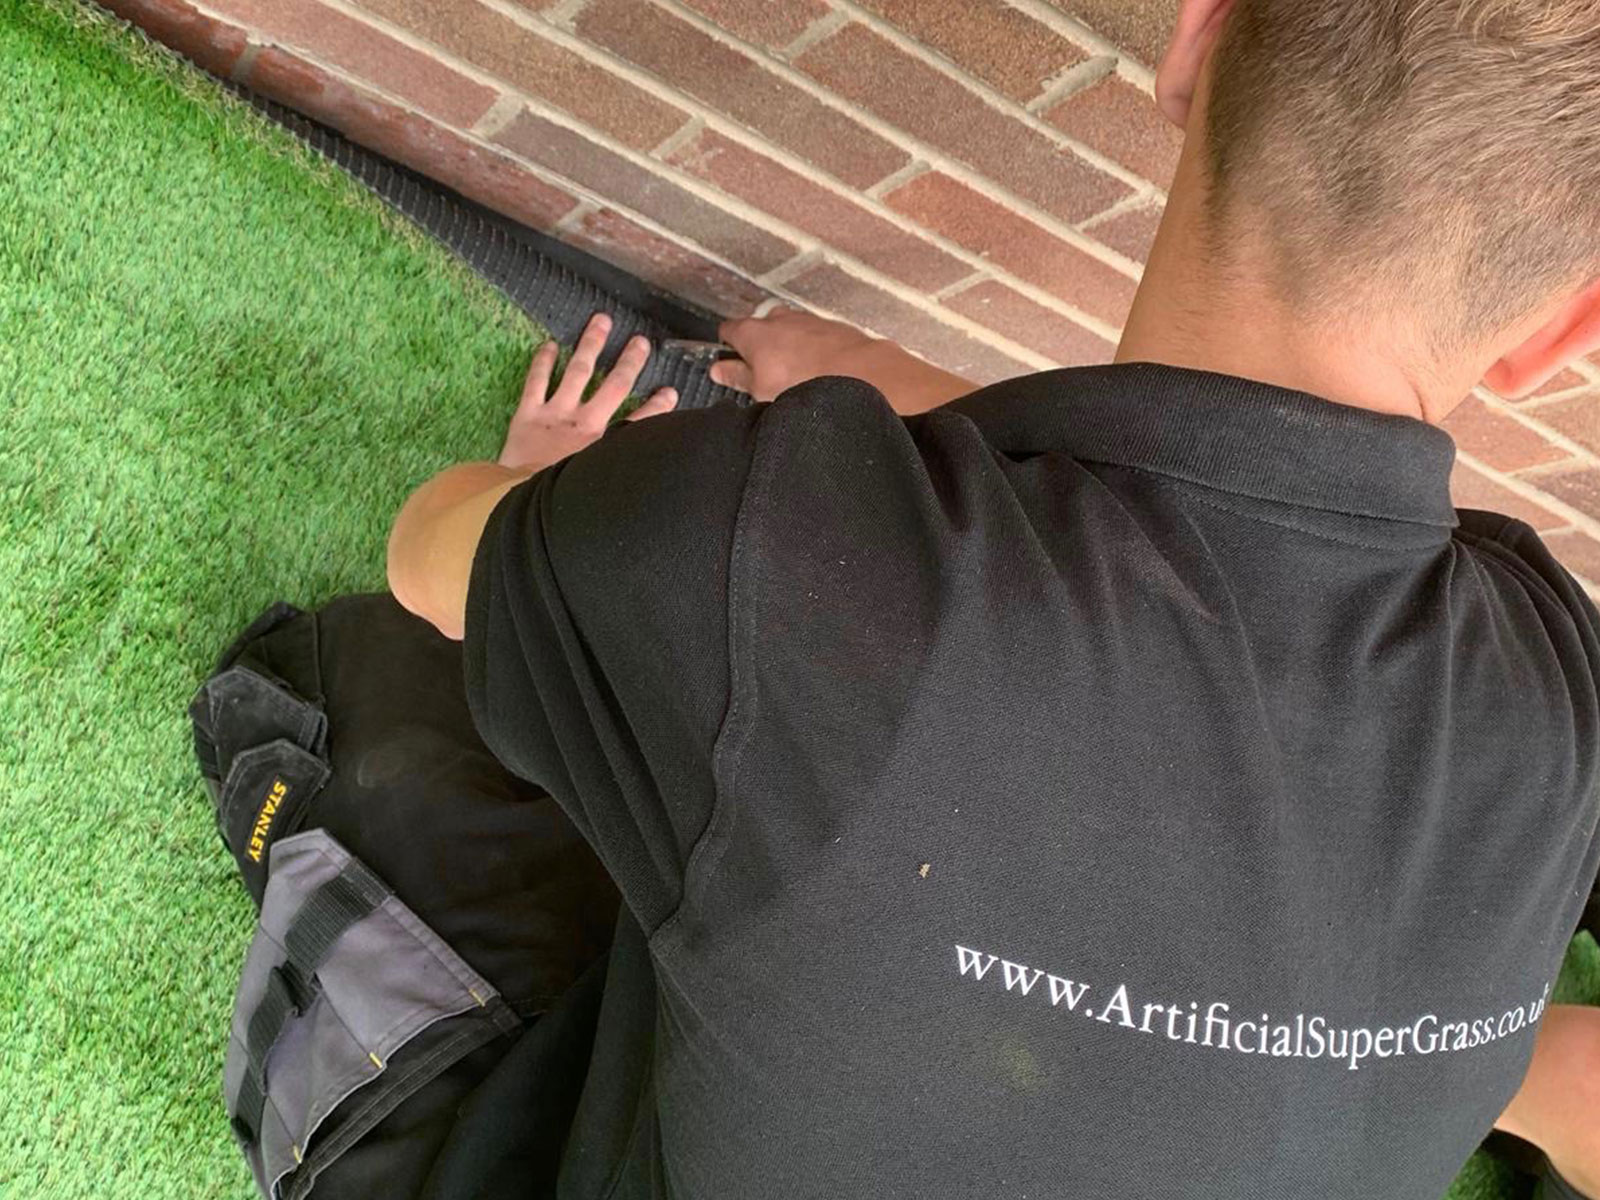 Fake Grass for Dogs Wigan Artificial Super Grass